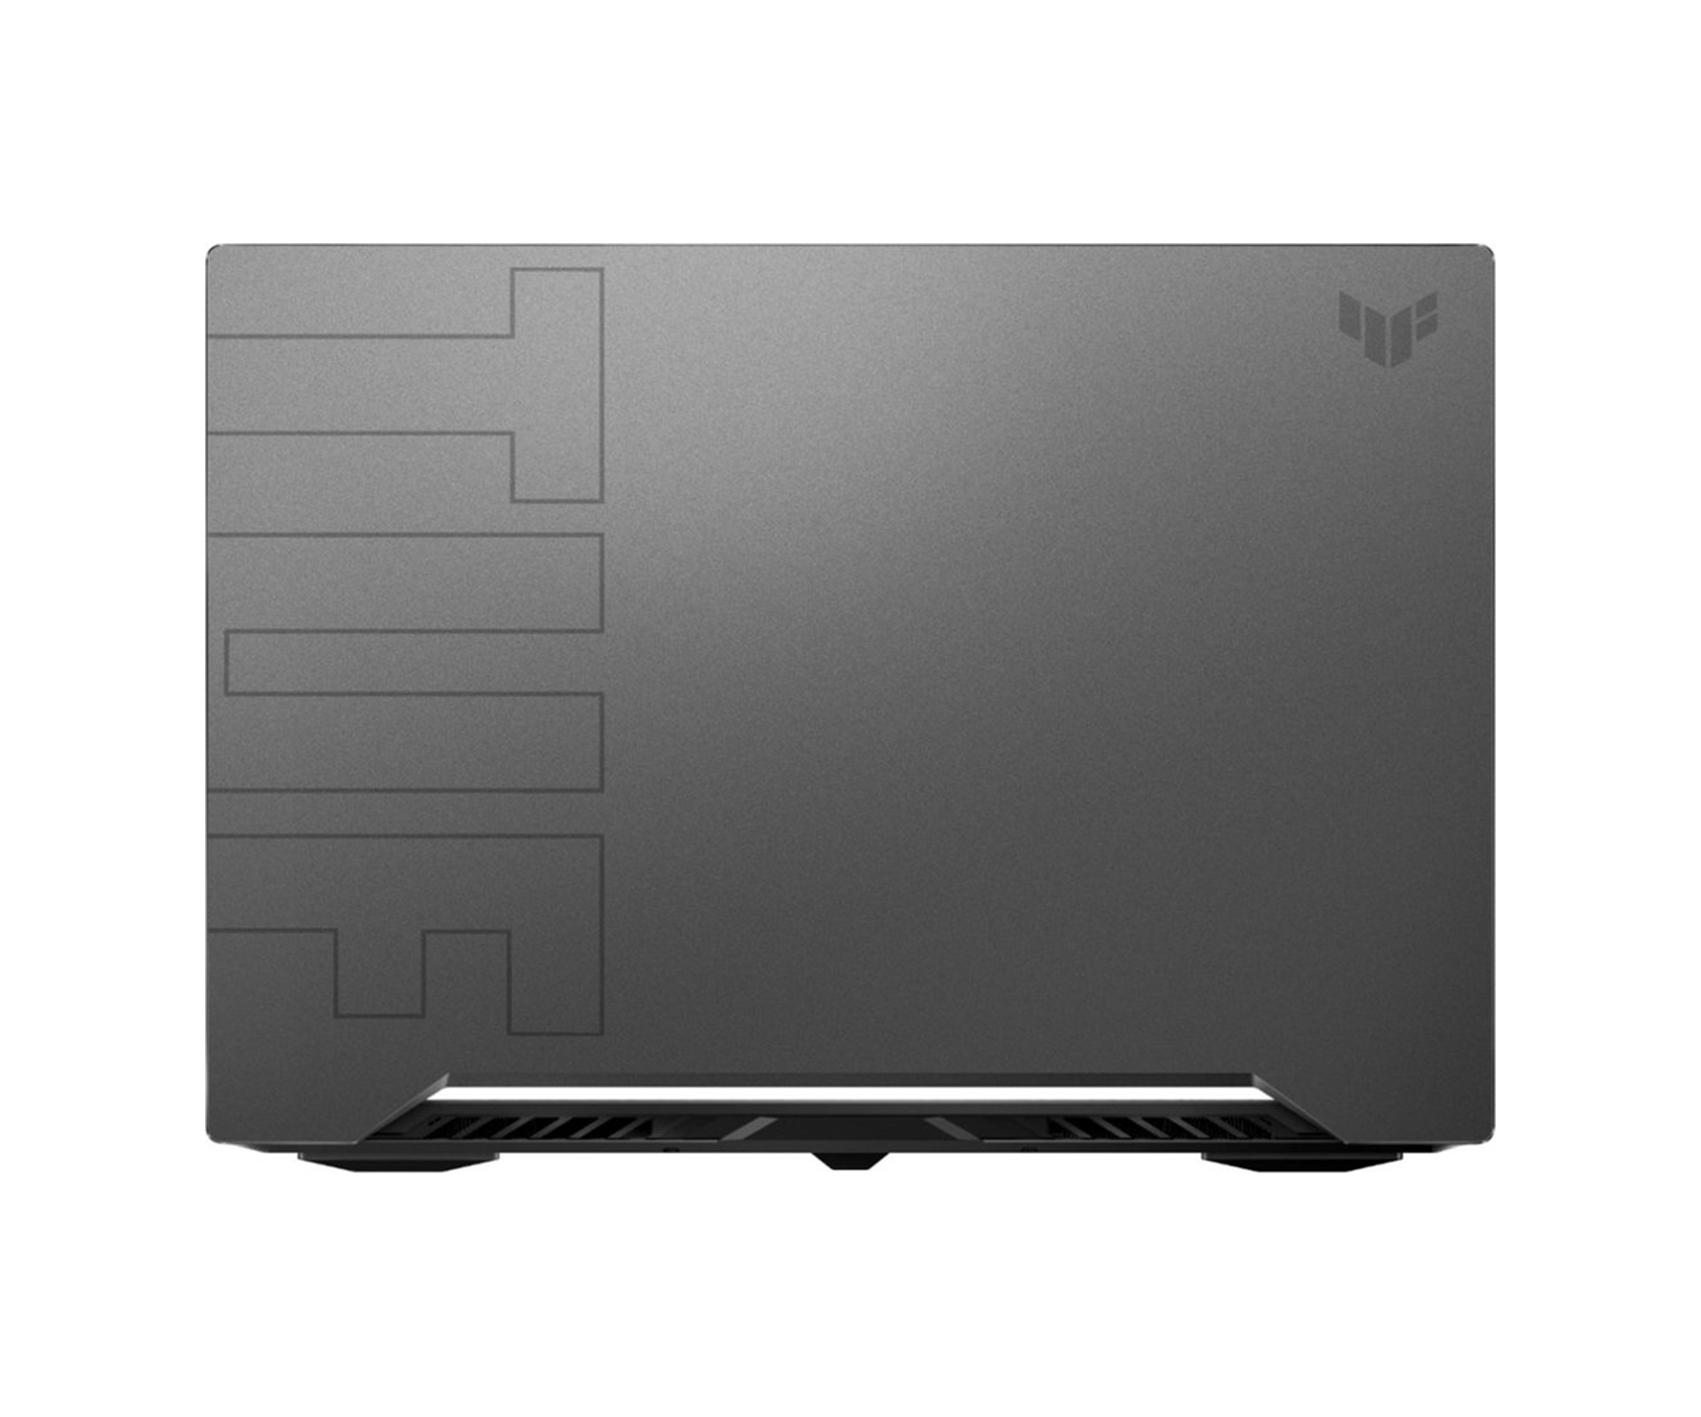 "ASUS - TUF DASH 15.6"" Gaming Laptop - Intel 11th Gen i7 - 16GB Memory - NVIDIA GeForce RTX 3060 - 512GB SSD - Eclipse Grey (FX516PM-211.TF15)"